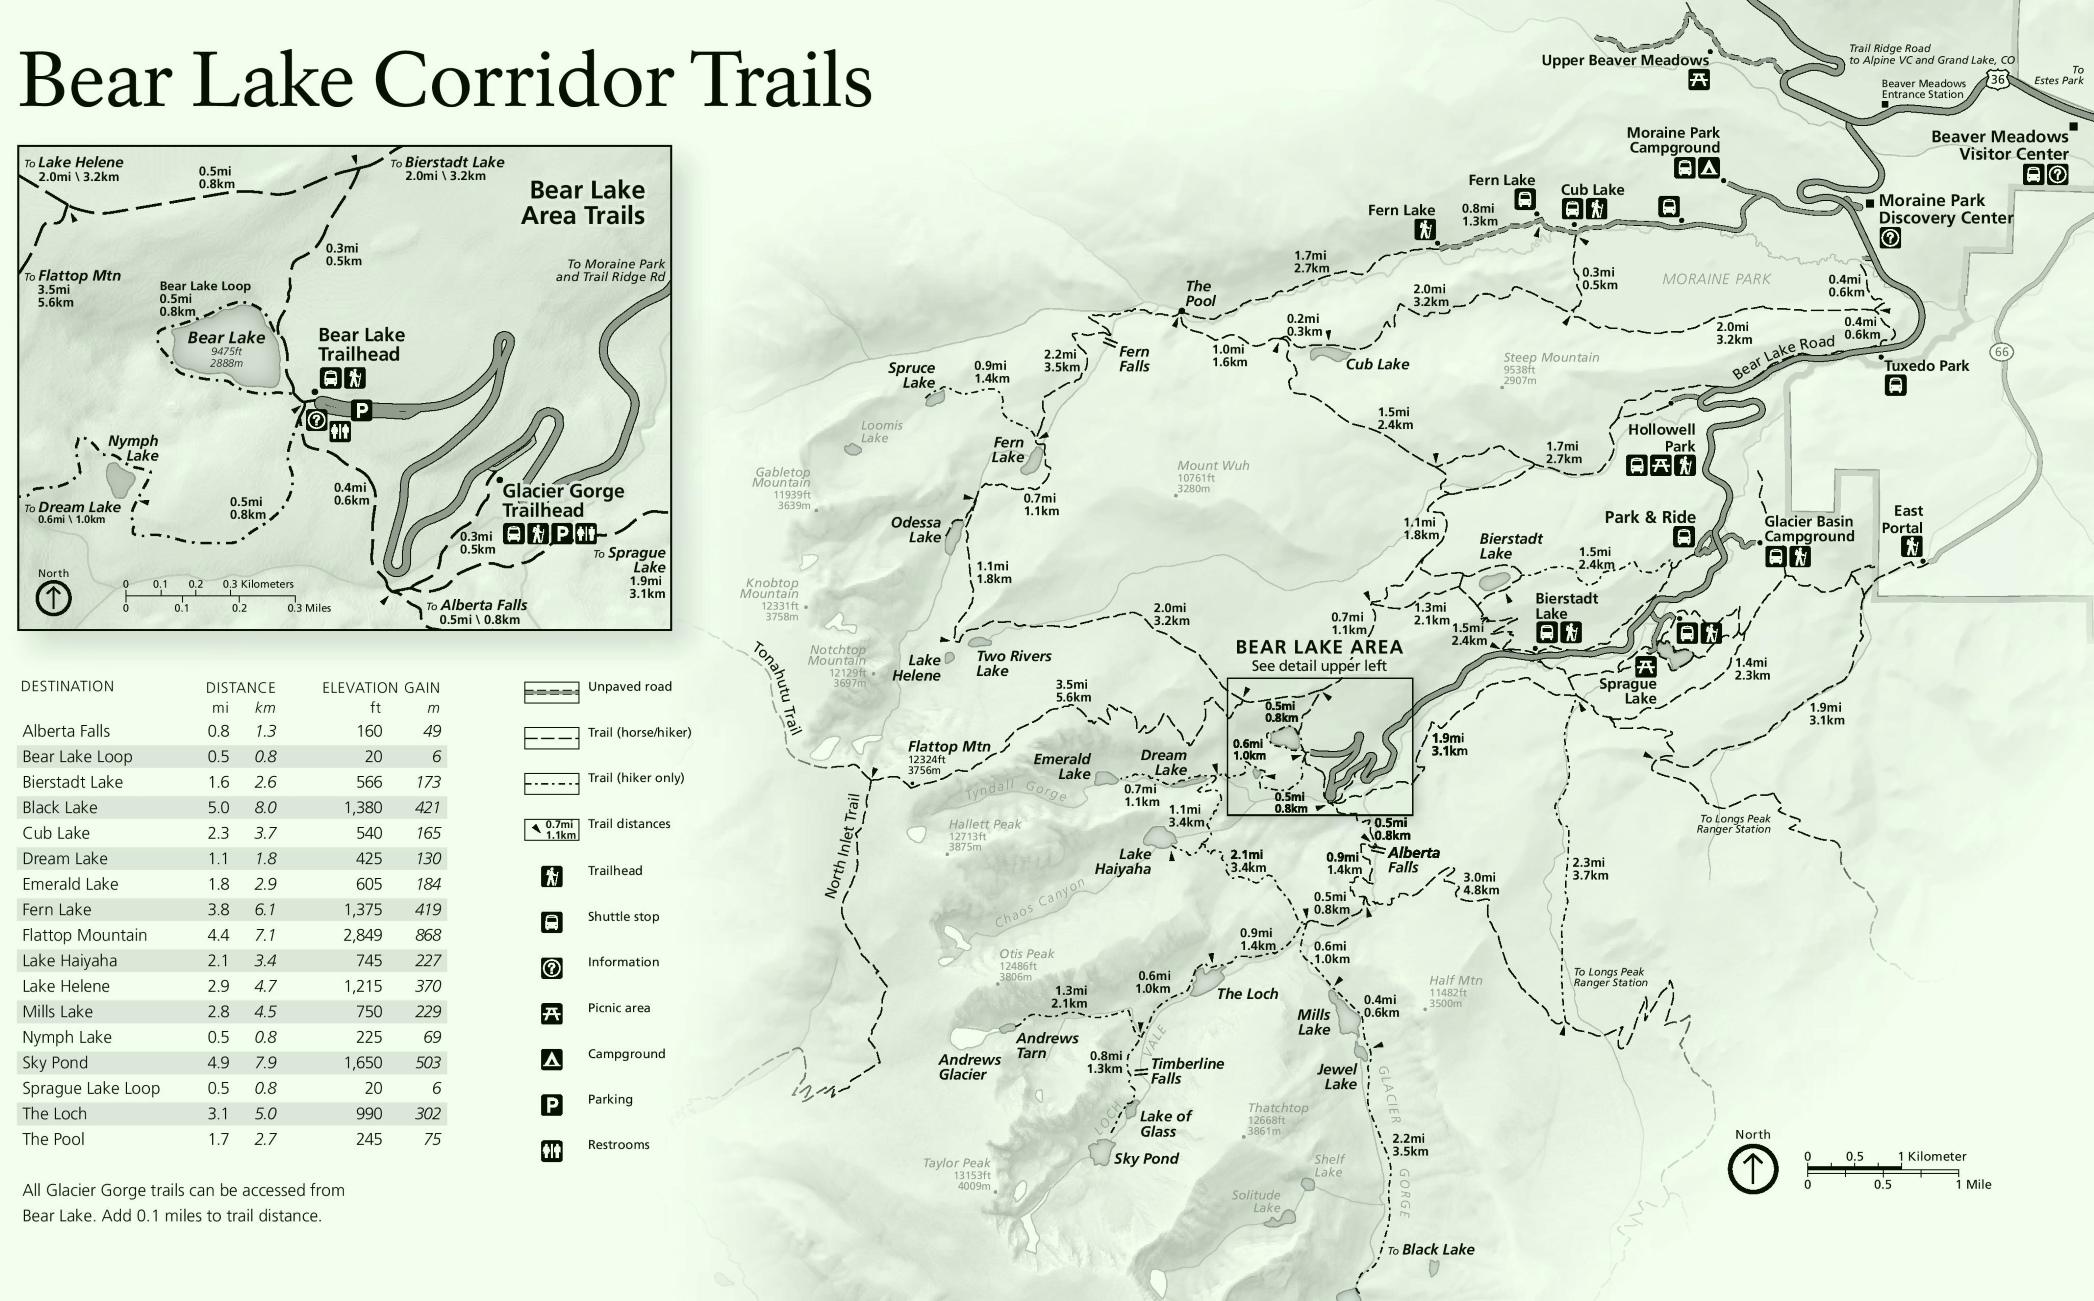 Rocky Mountain Bear Lake Corridors trails map